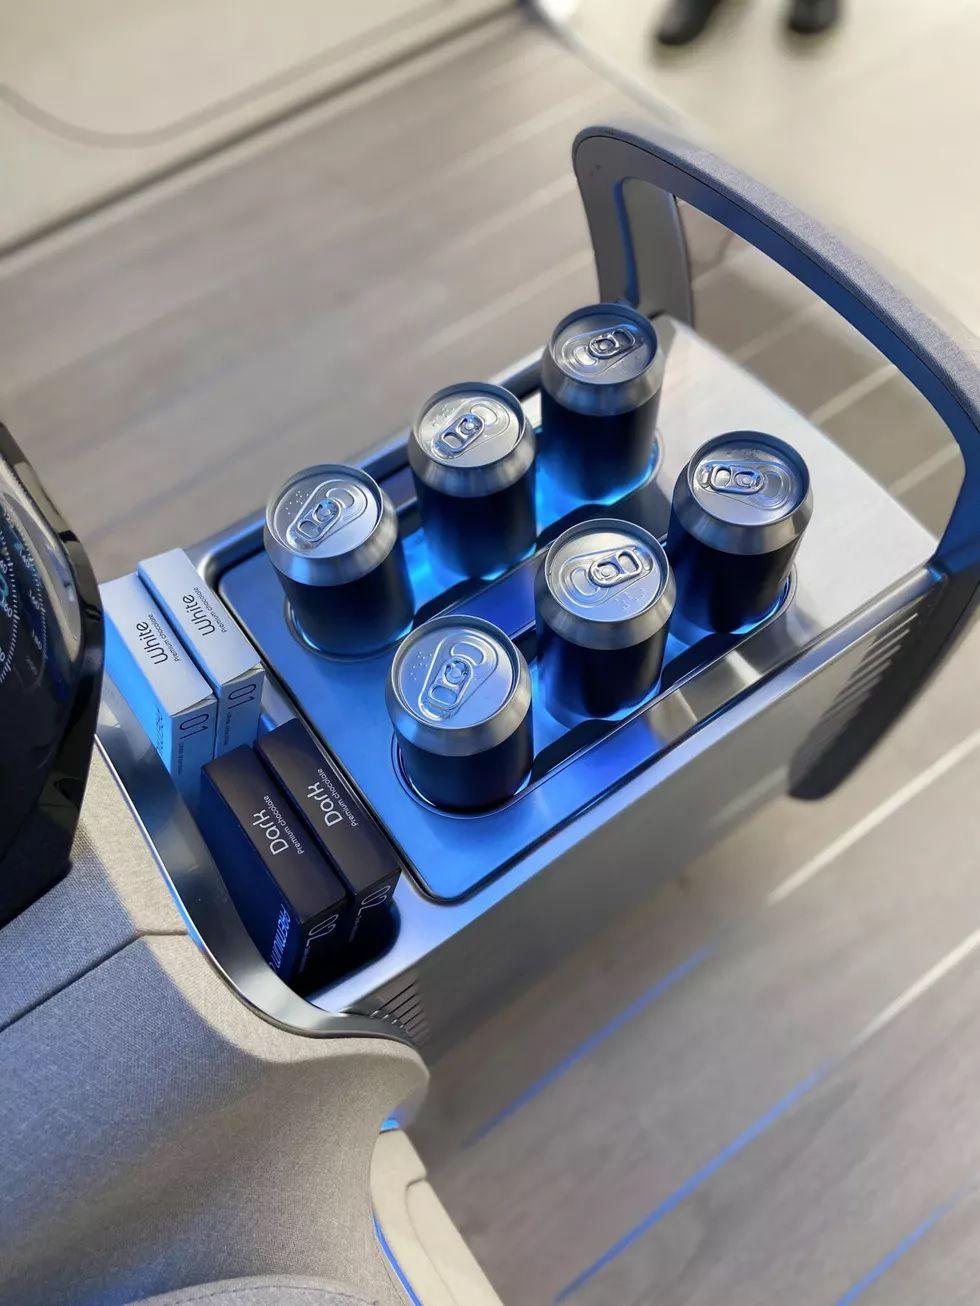 LG Hyundai EVs Cabin 1 طرح مفهومی هیوندای و ال جی برای کابین خودروهای برقی: ربات و تلویزیون غول پیکر اخبار IT